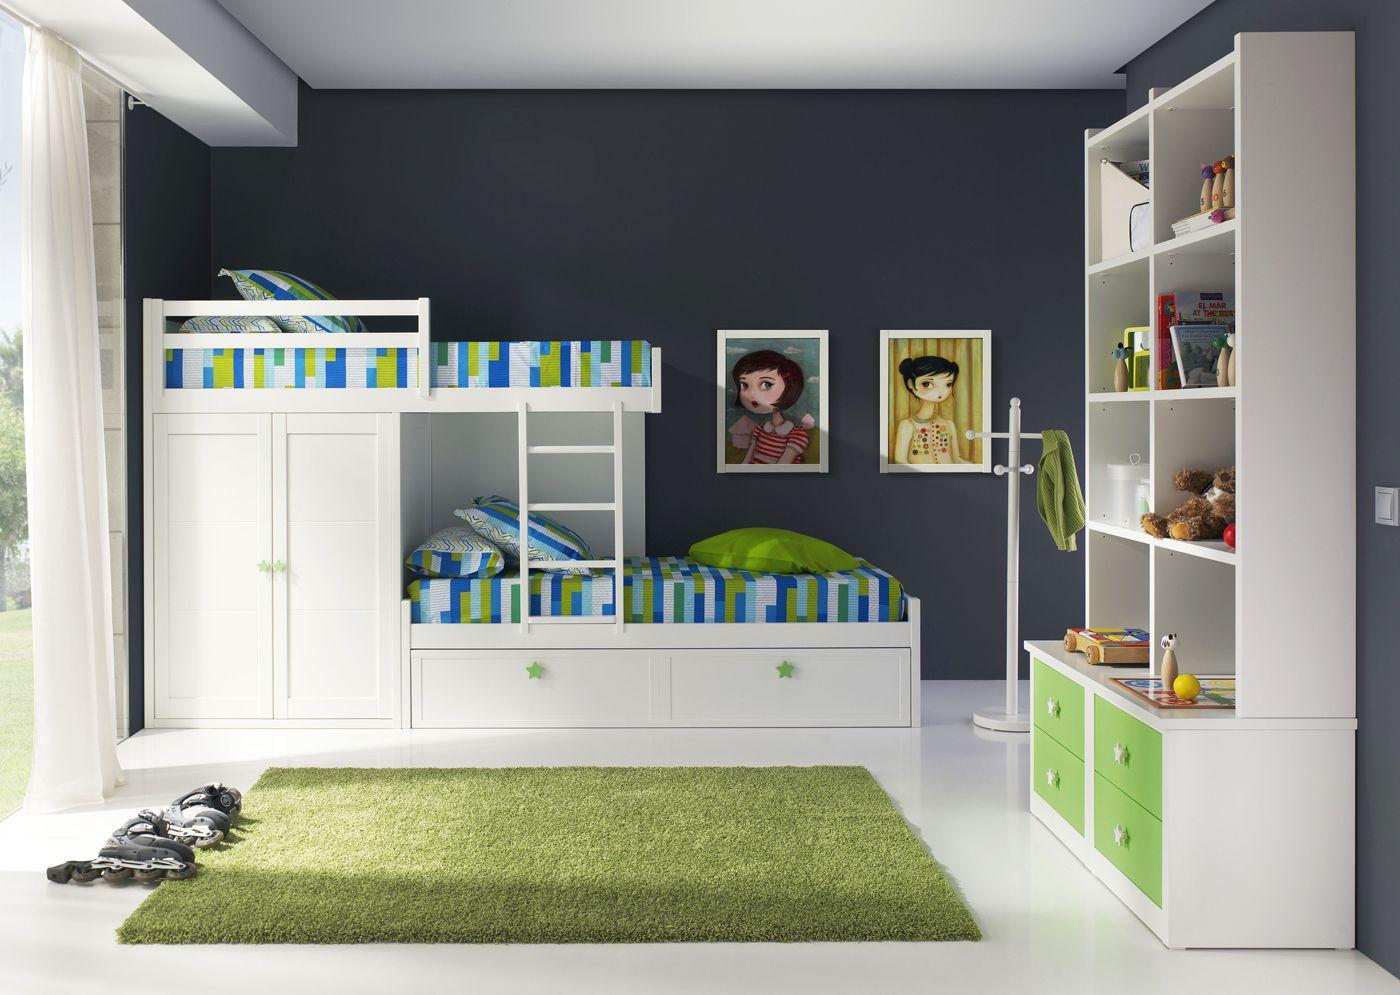 dormitorio infantil con camas litera tipo tren ms info en tudecora